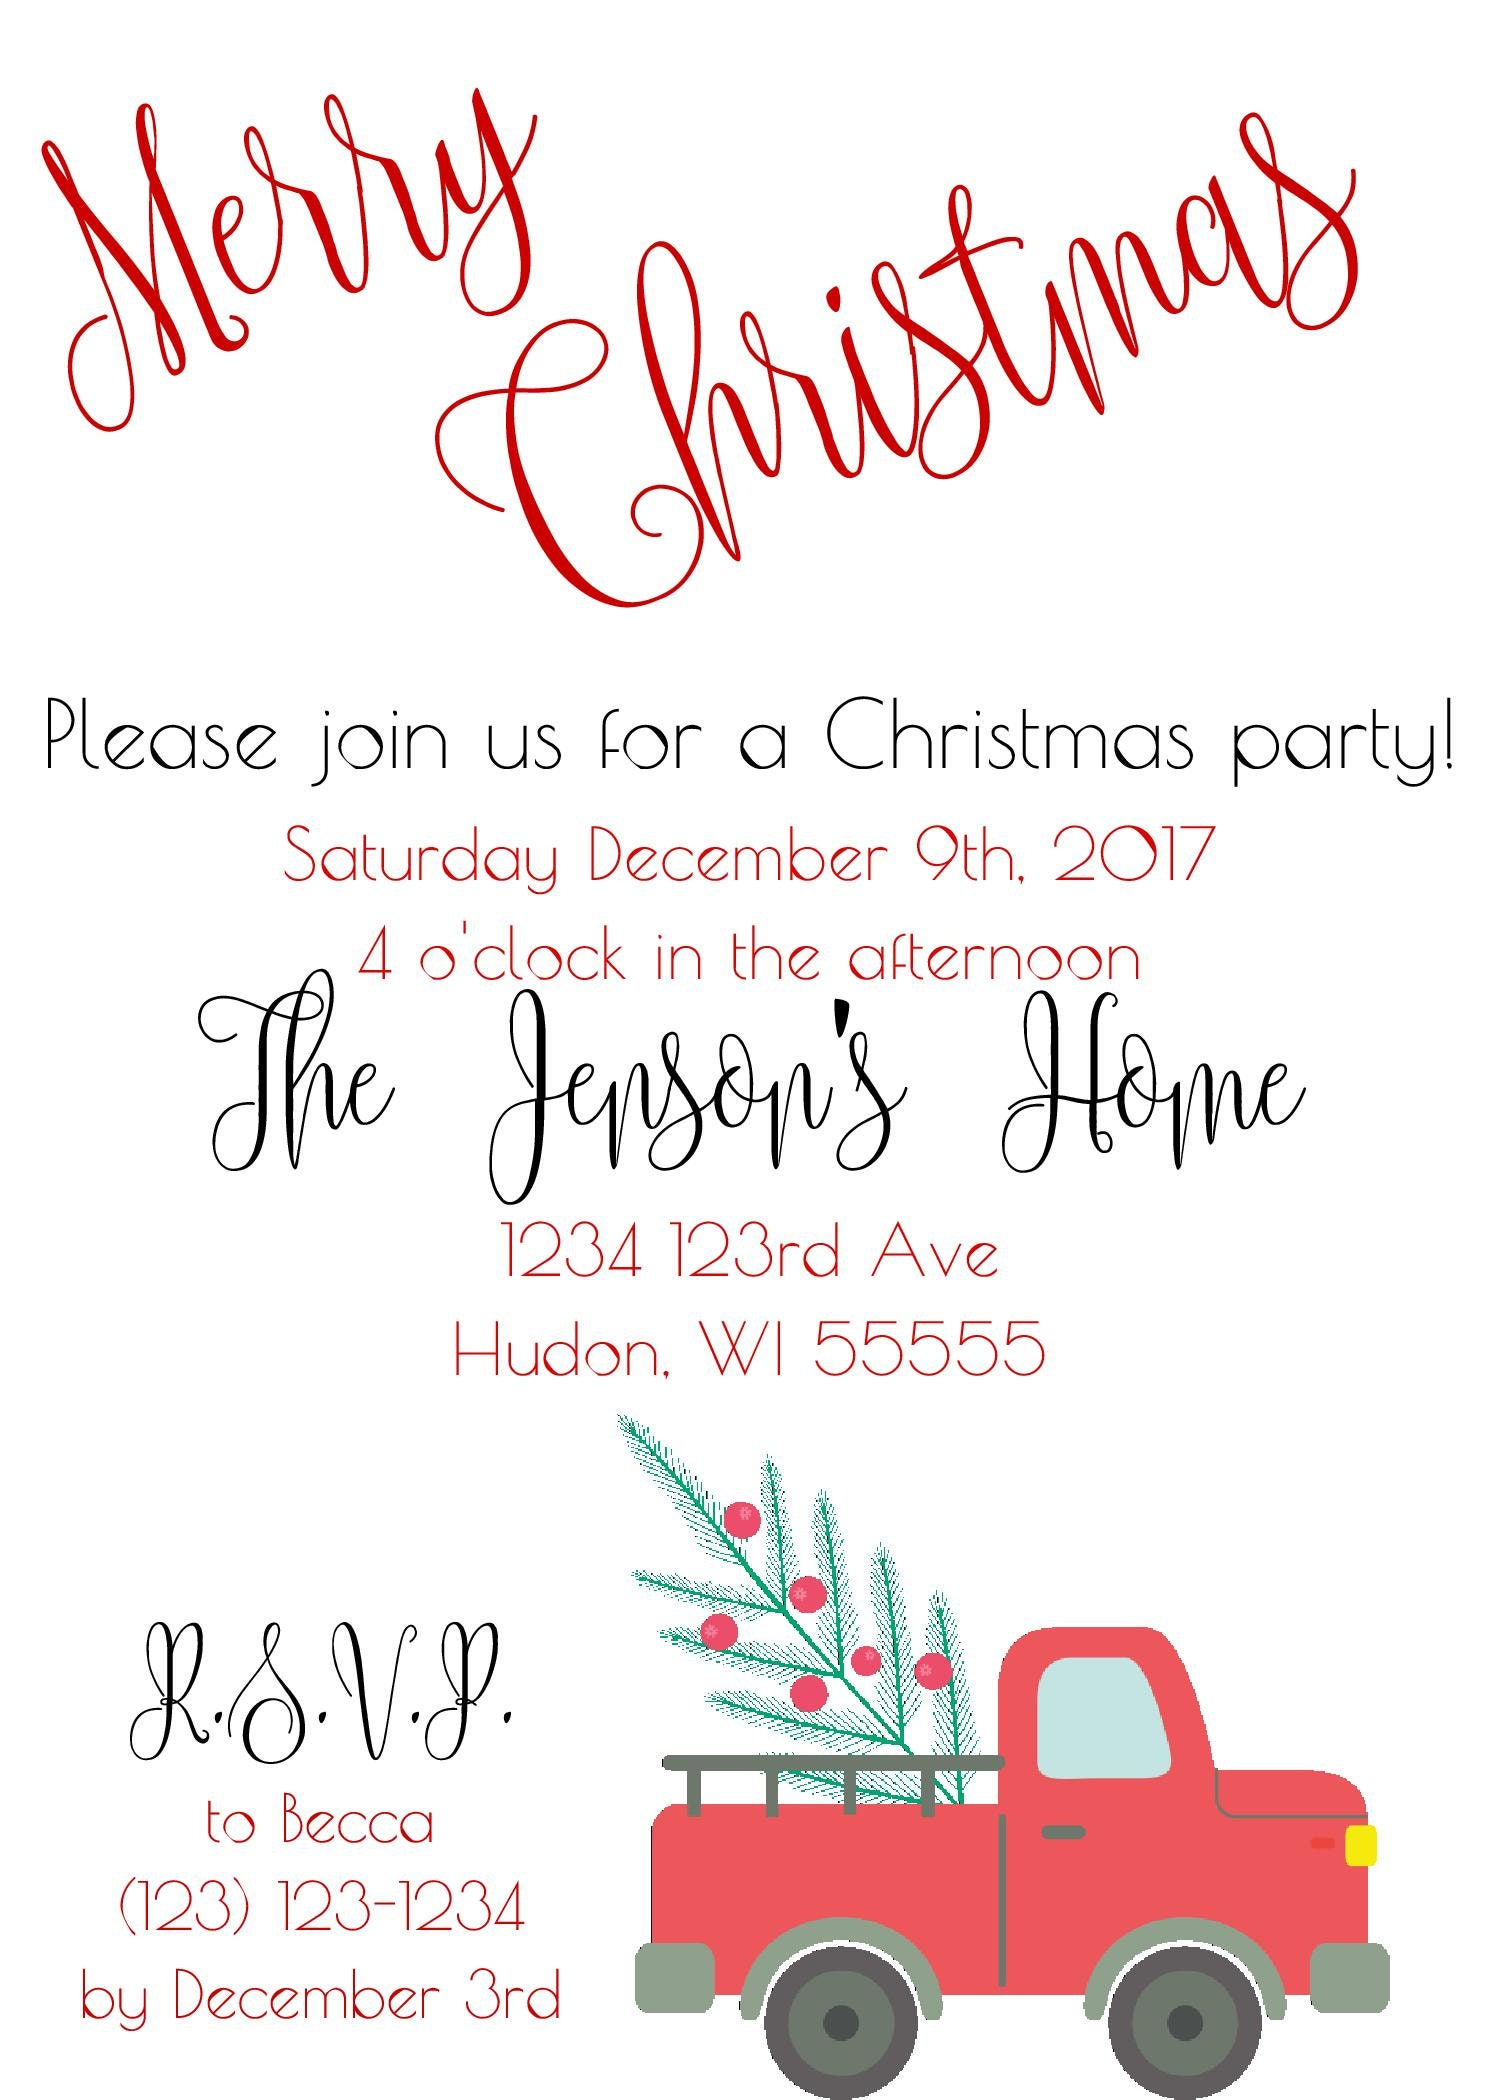 Christmas Party Invitation - DIY Christmas Party - Christmas ...